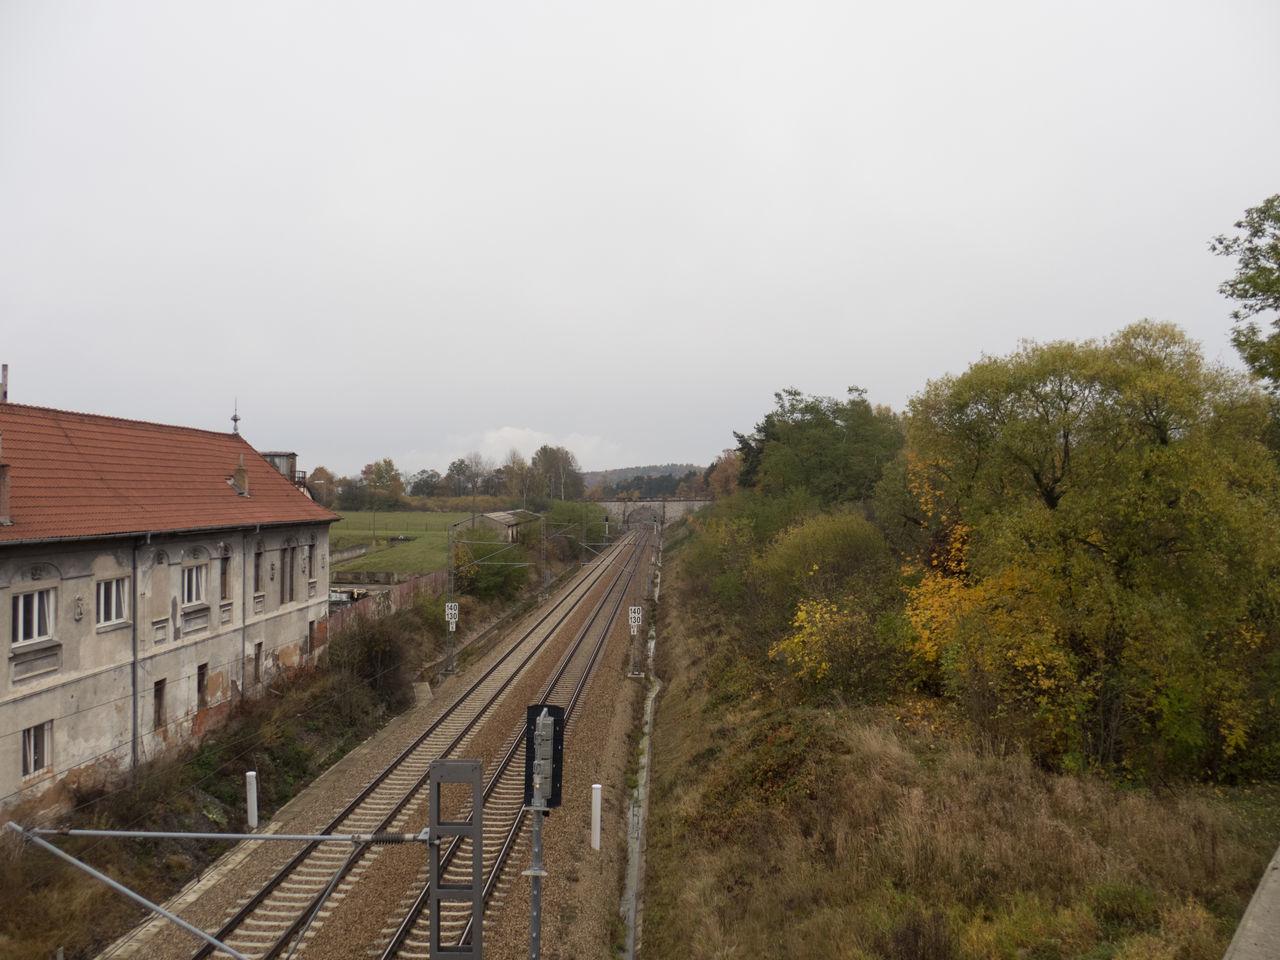 Fall Fall Colors Lines The Way Forward Train Train Station Train Tracks